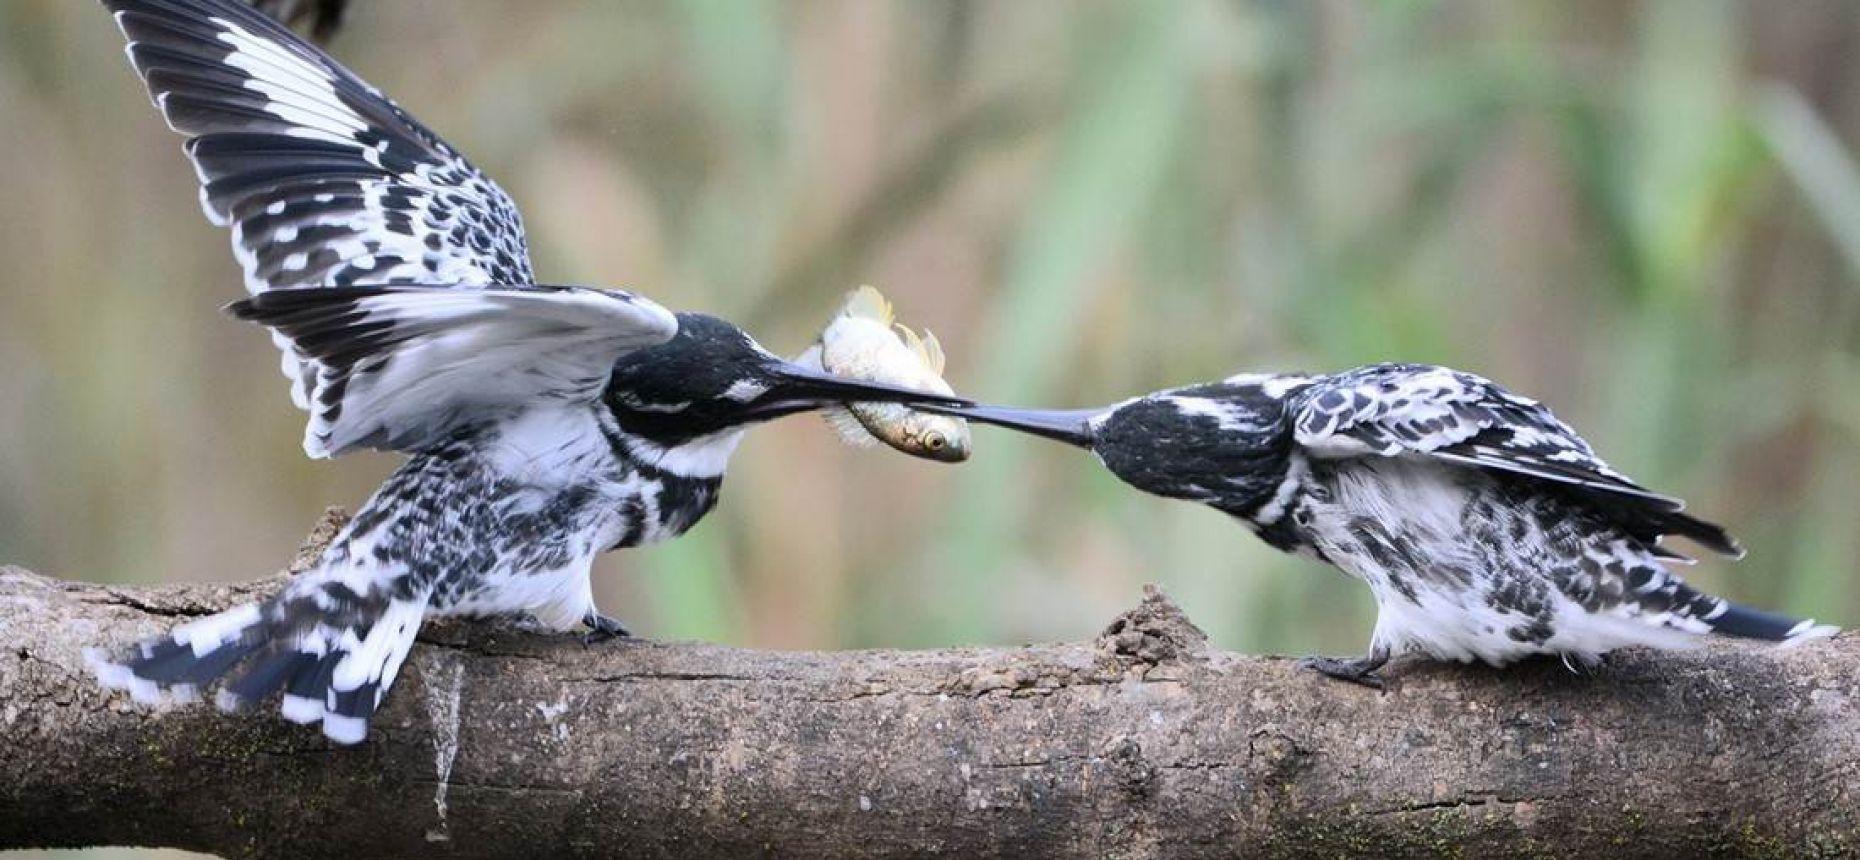 Зимородок — забавная птица-рыболов